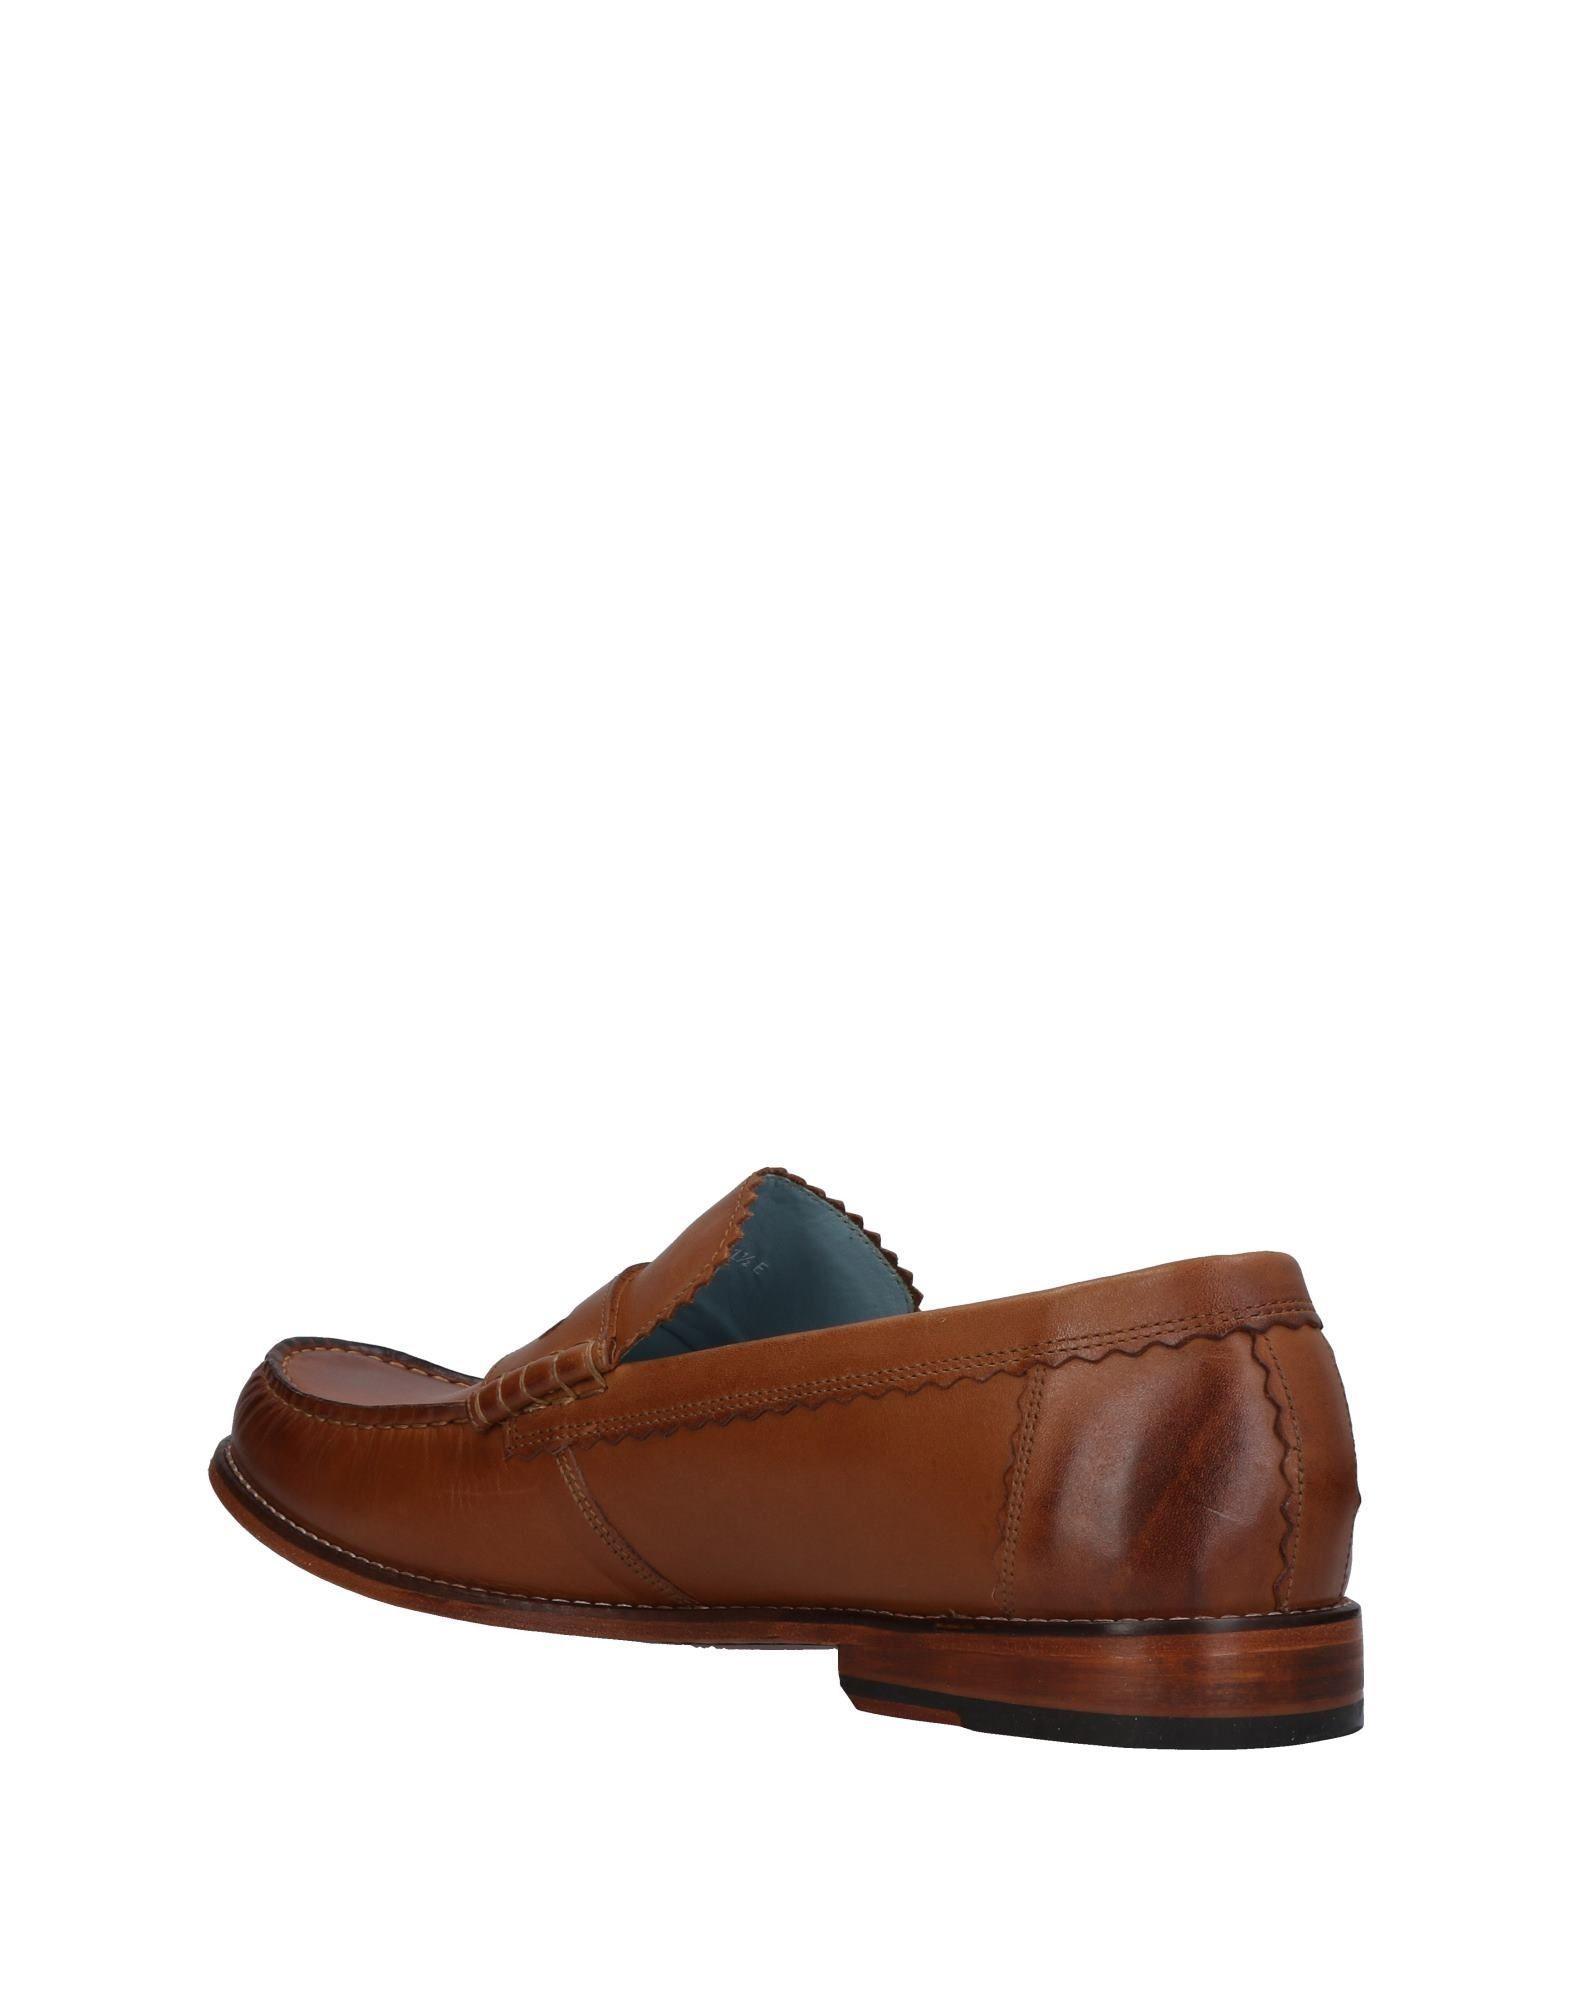 0570e88d564 Lyst - Grenson Loafer in Brown for Men